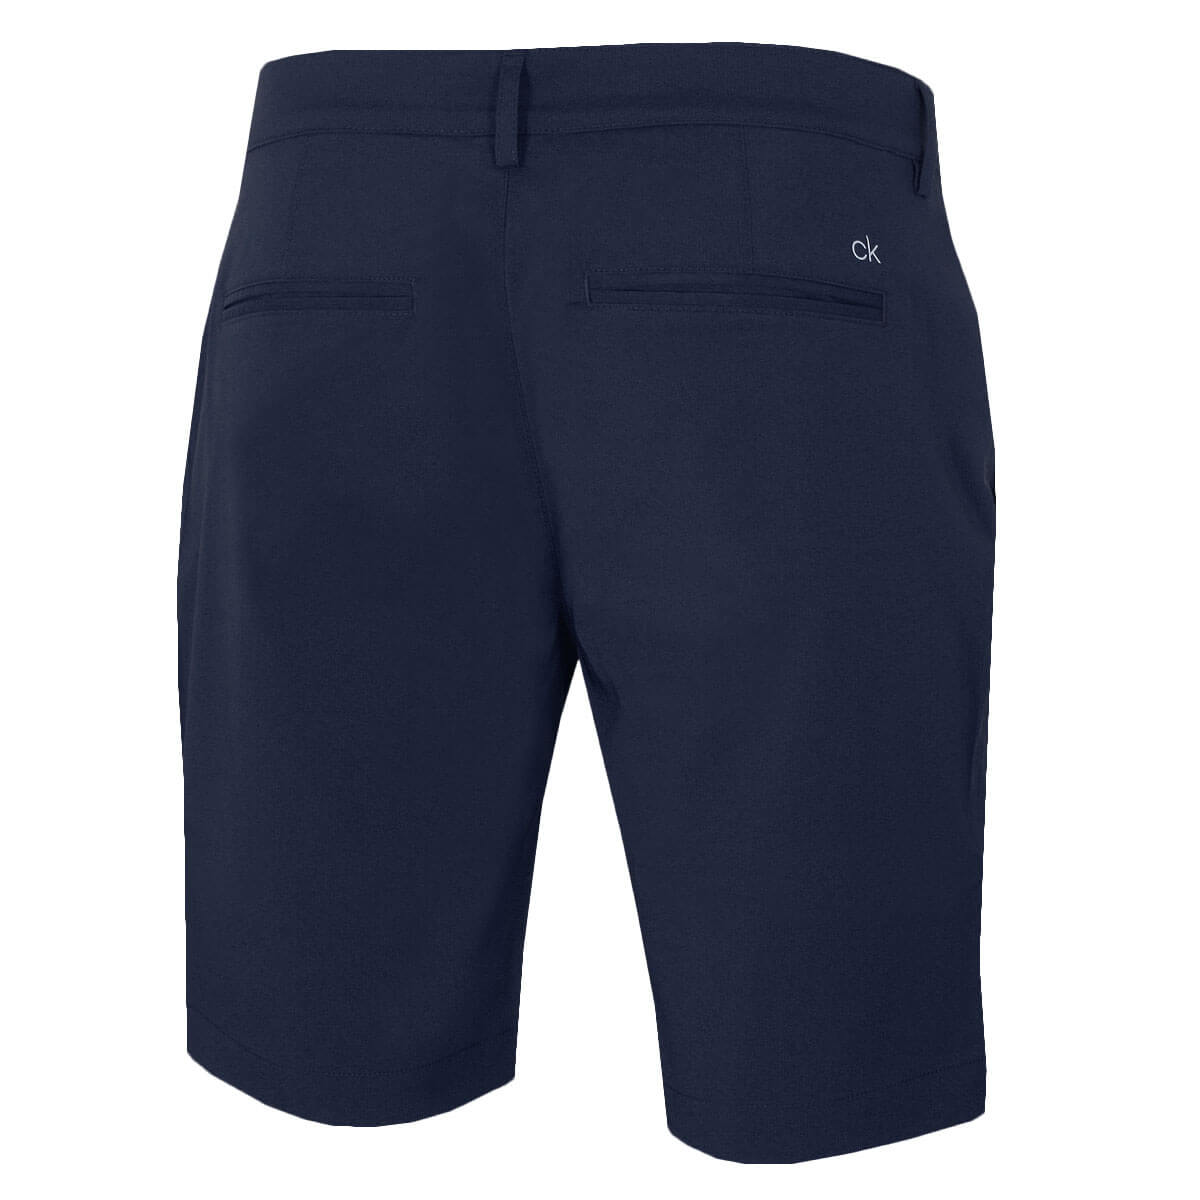 thumbnail 12 - Calvin Klein Mens 2021 Slim Fit Micro Tech Lightweight Golf Shorts 34% OFF RRP